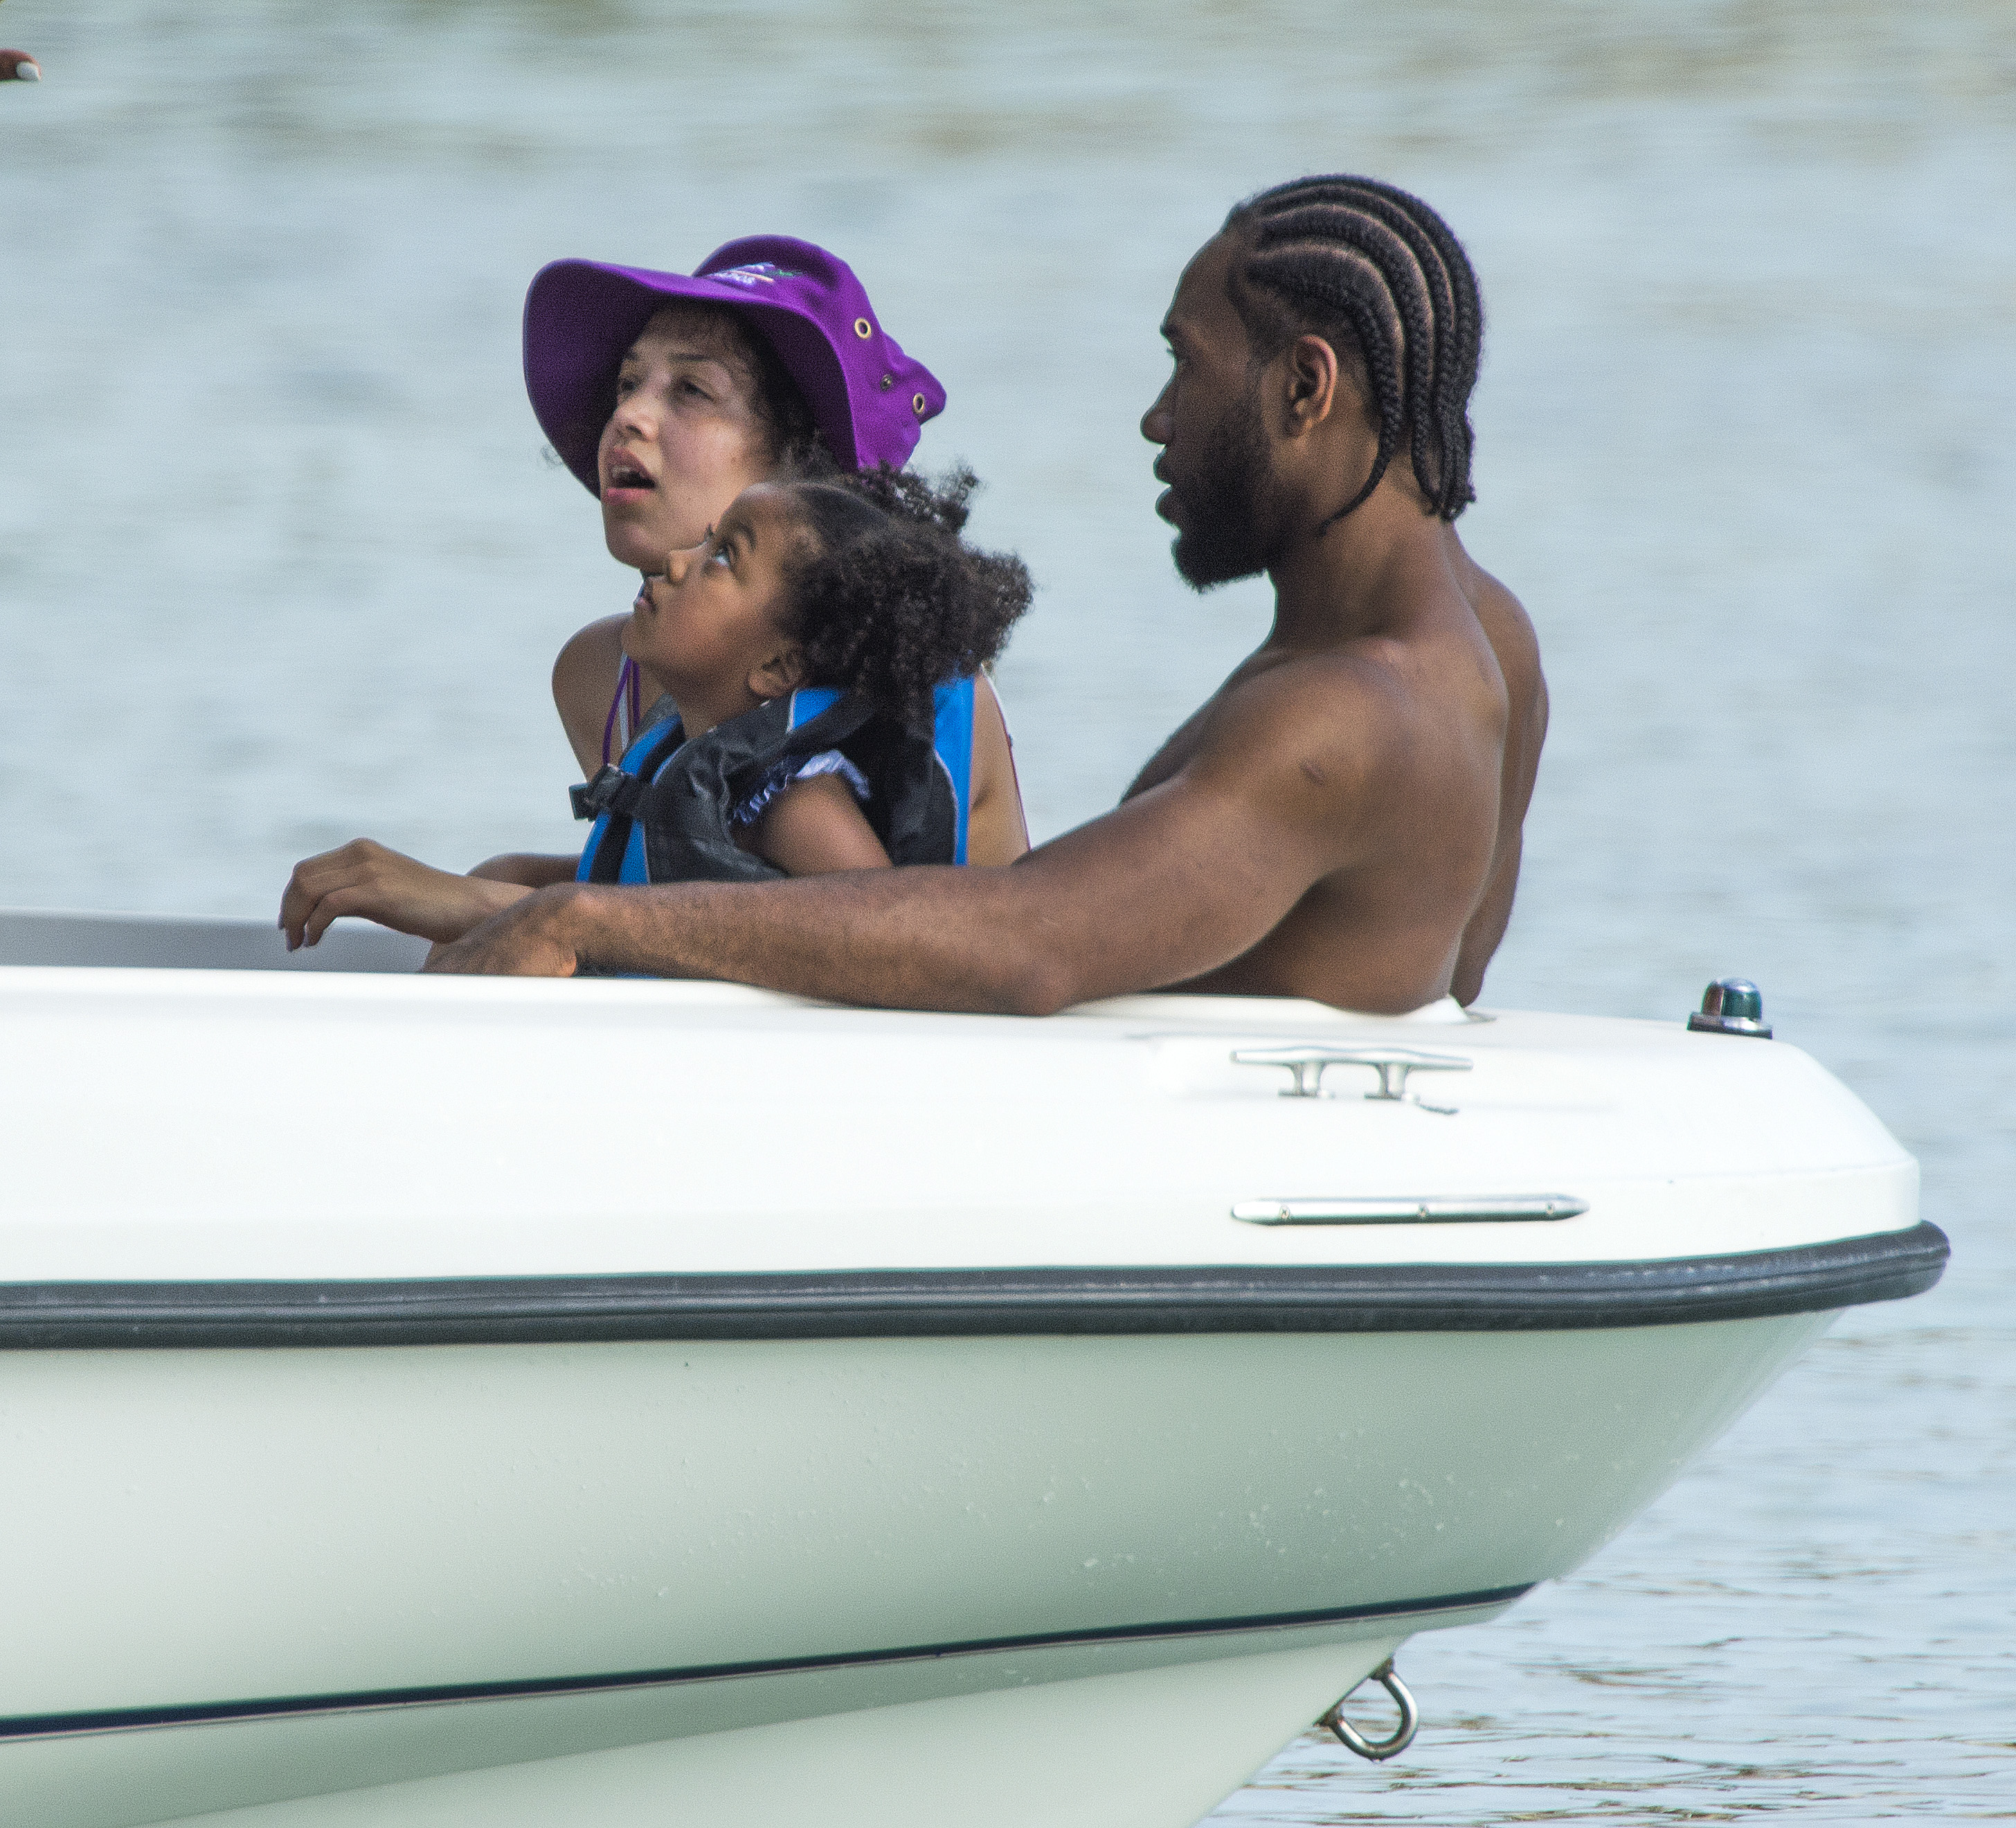 Kawhi Leonard, Kishele Shipley and their daughter vacation in Barbados